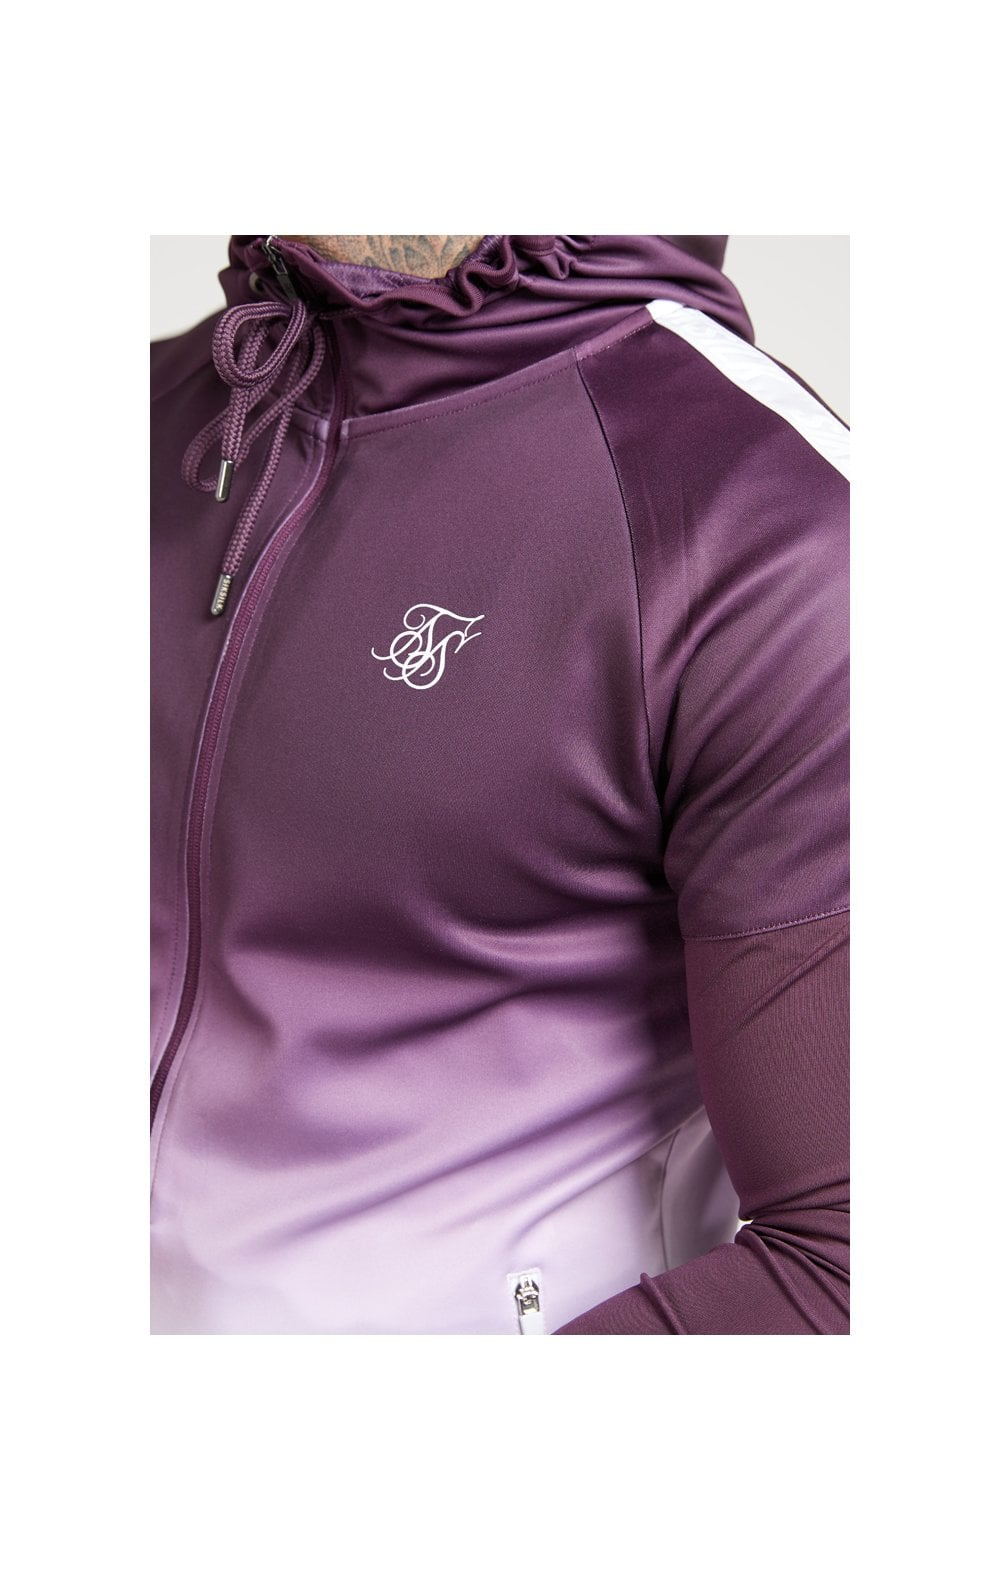 SikSilk SikSilk Athlete Hybrid Zip Through Hoodie  Rich Burgundy Fade